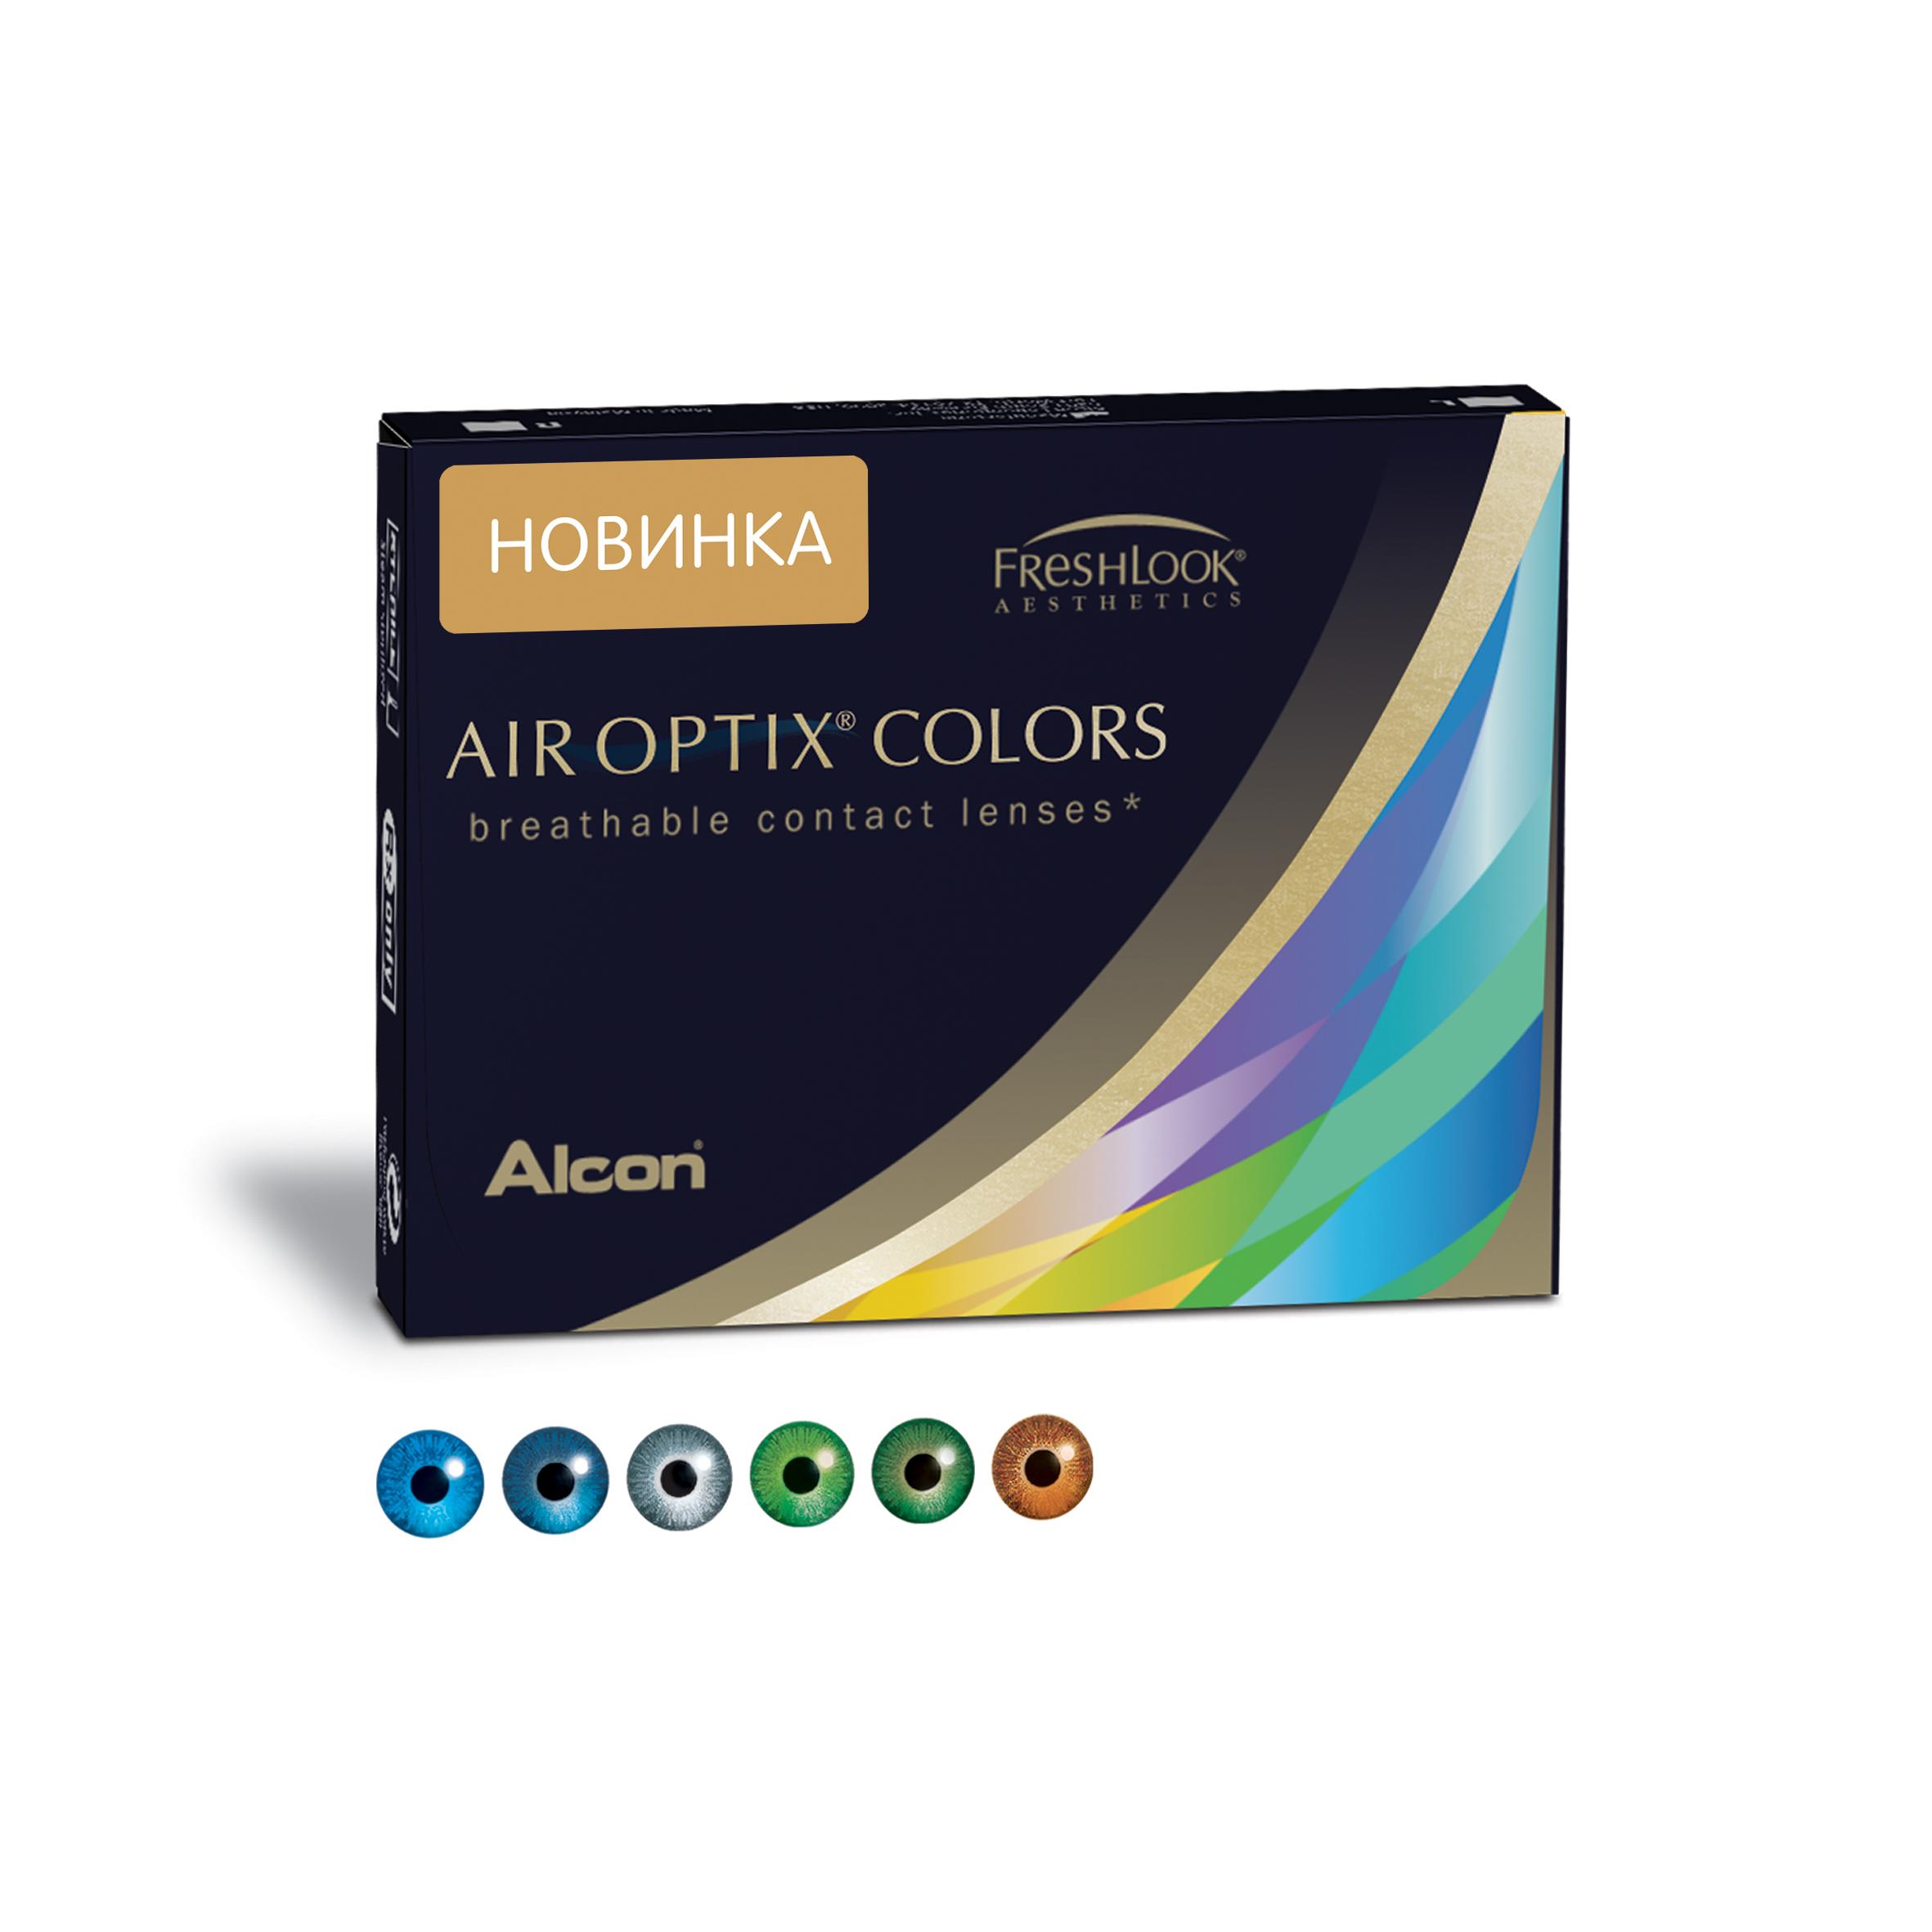 Аlcon контактные линзы Air Optix Colors 2 шт -1.75 Brilliant Blue31746149Мягкие контактные линзы